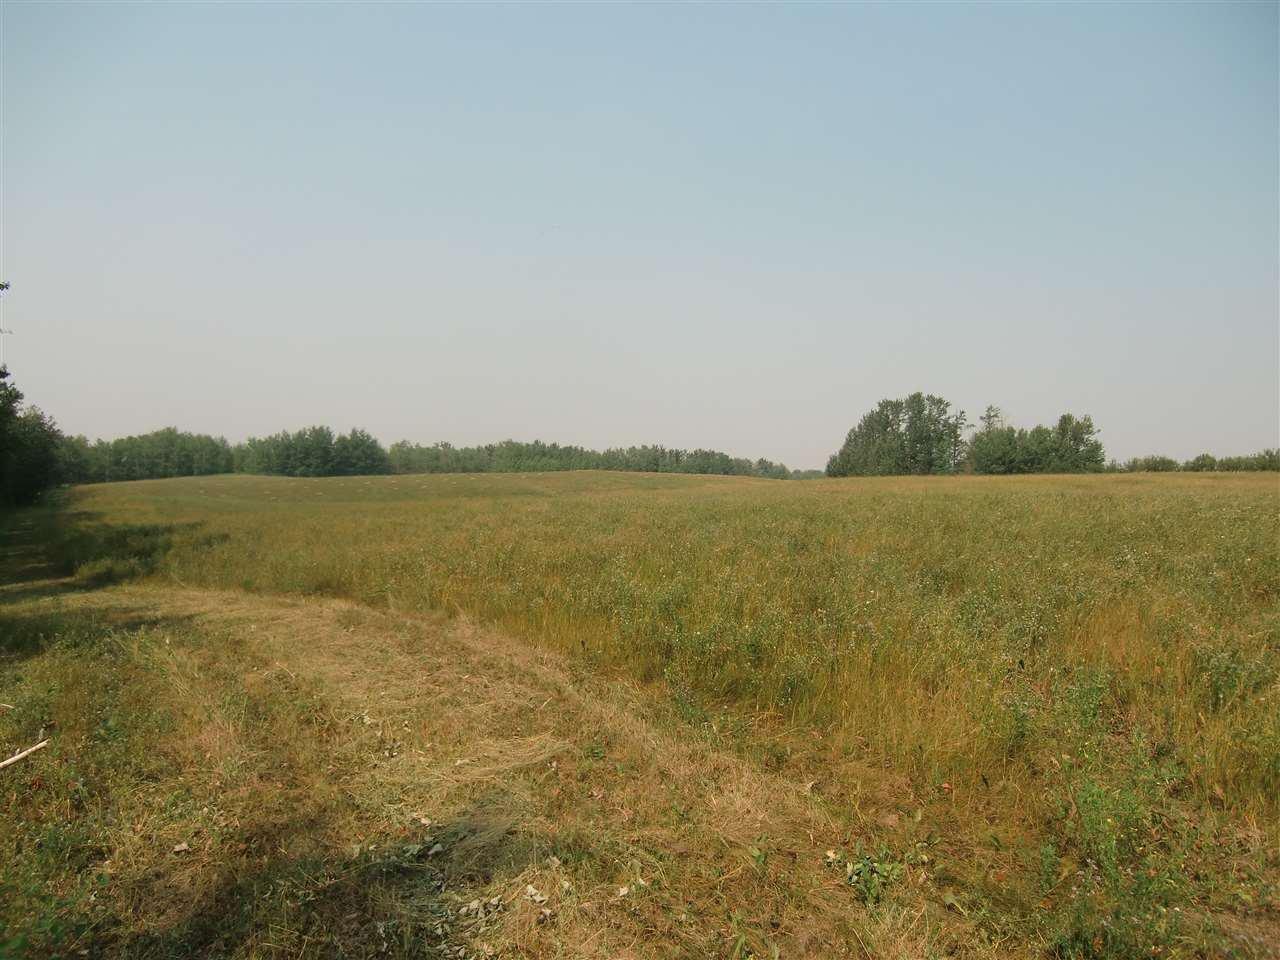 Main Photo: Range Road 220 Township 530: Rural Strathcona County Rural Land/Vacant Lot for sale : MLS®# E4124889